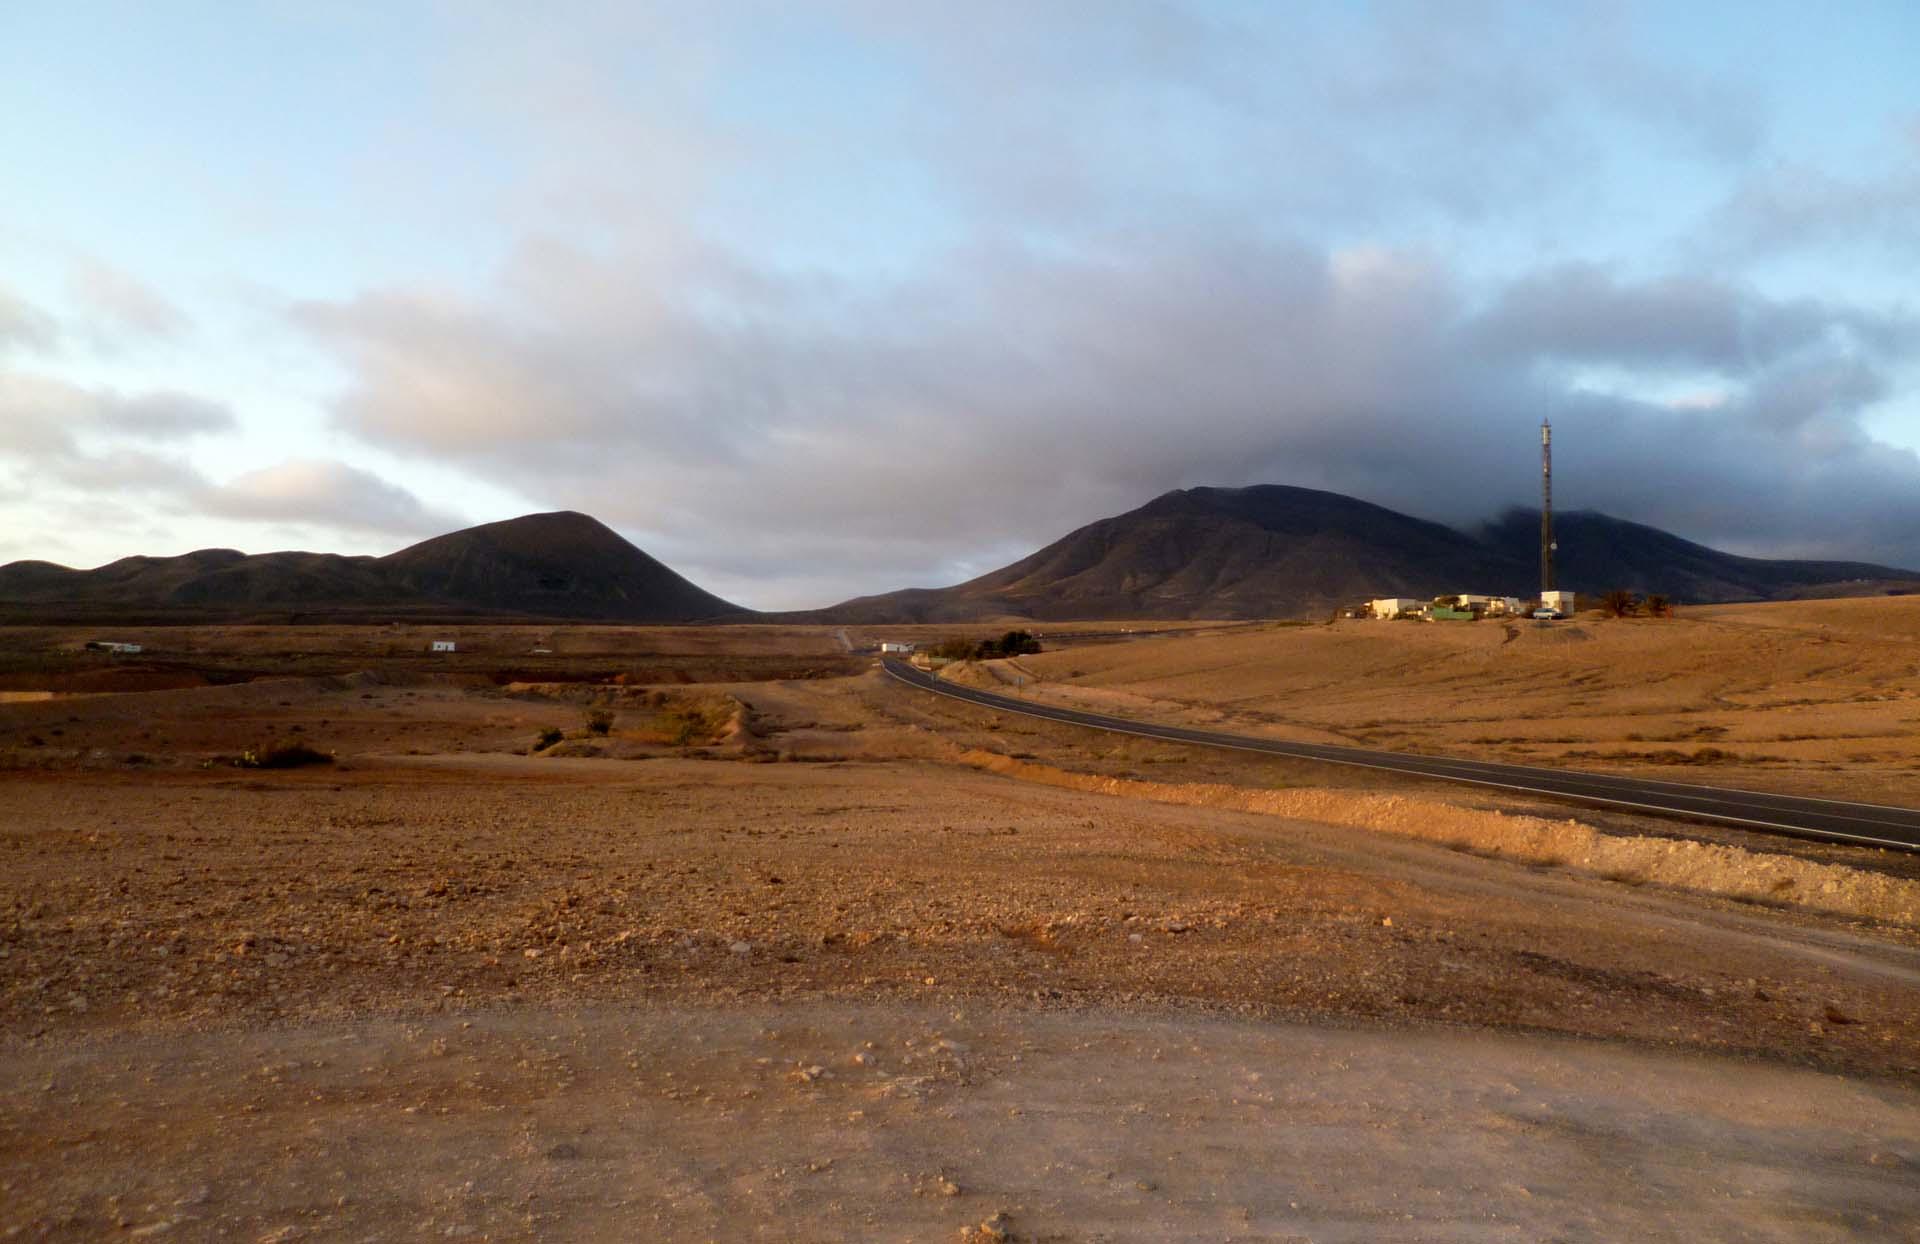 panorama di Fuerteventura nelle isole Canarie